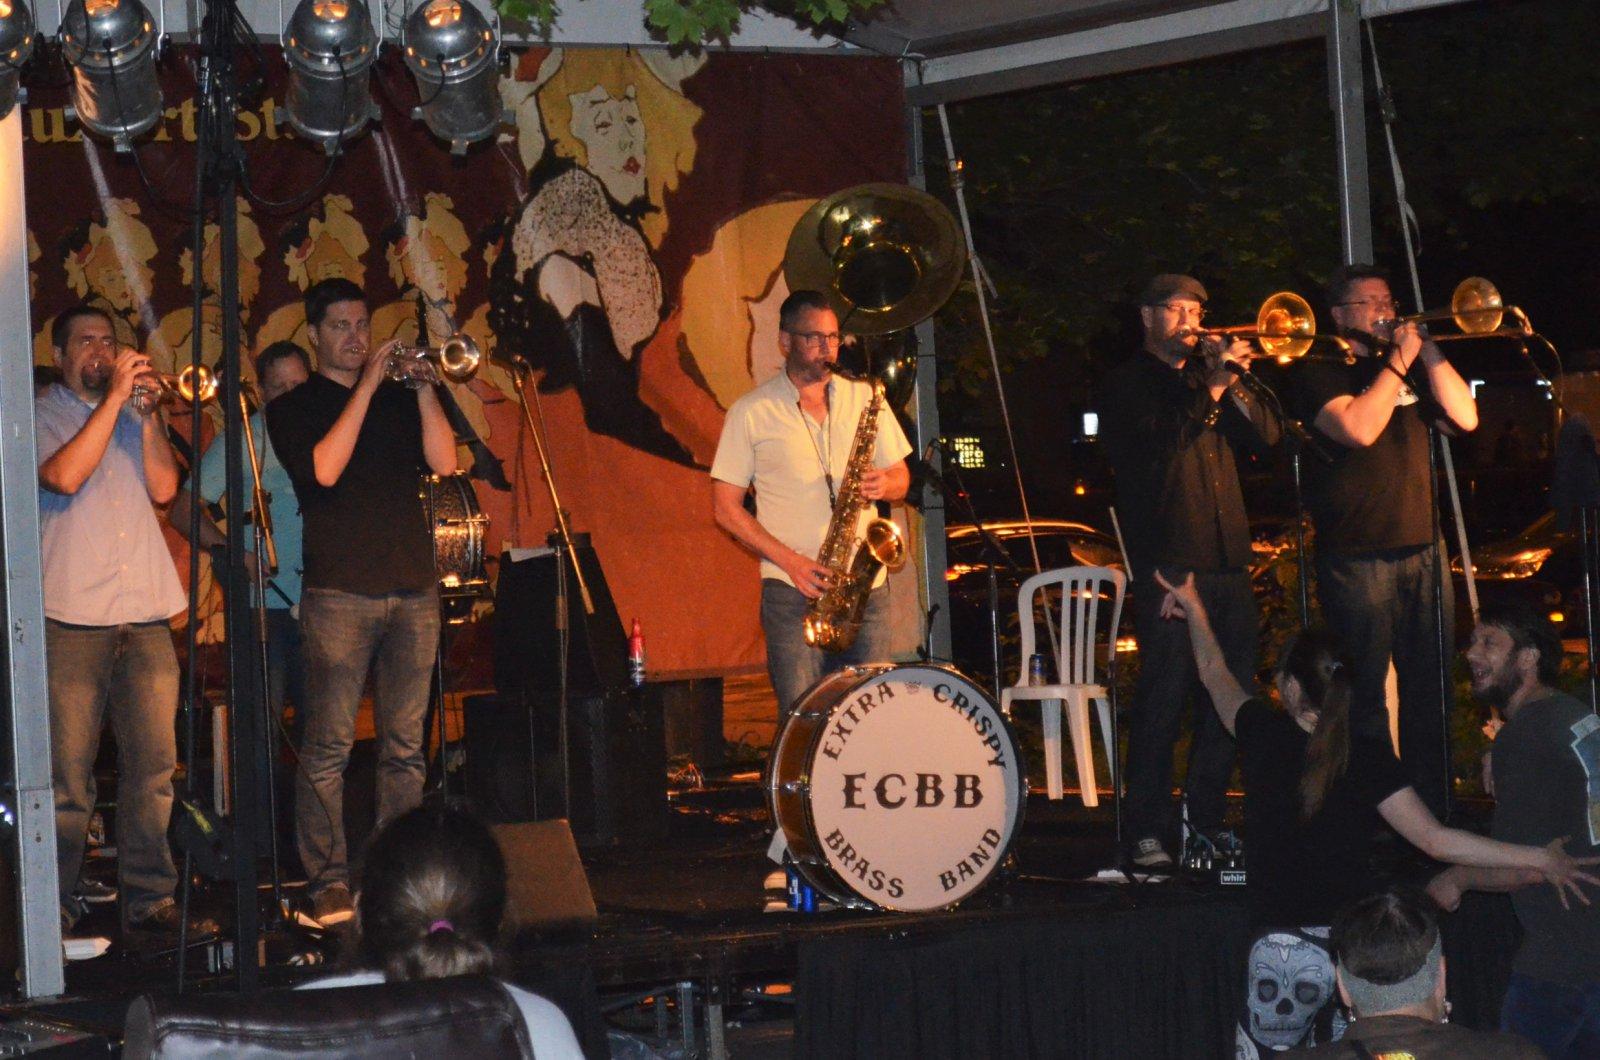 Extra Cripsy Brass Band at Bastille Days